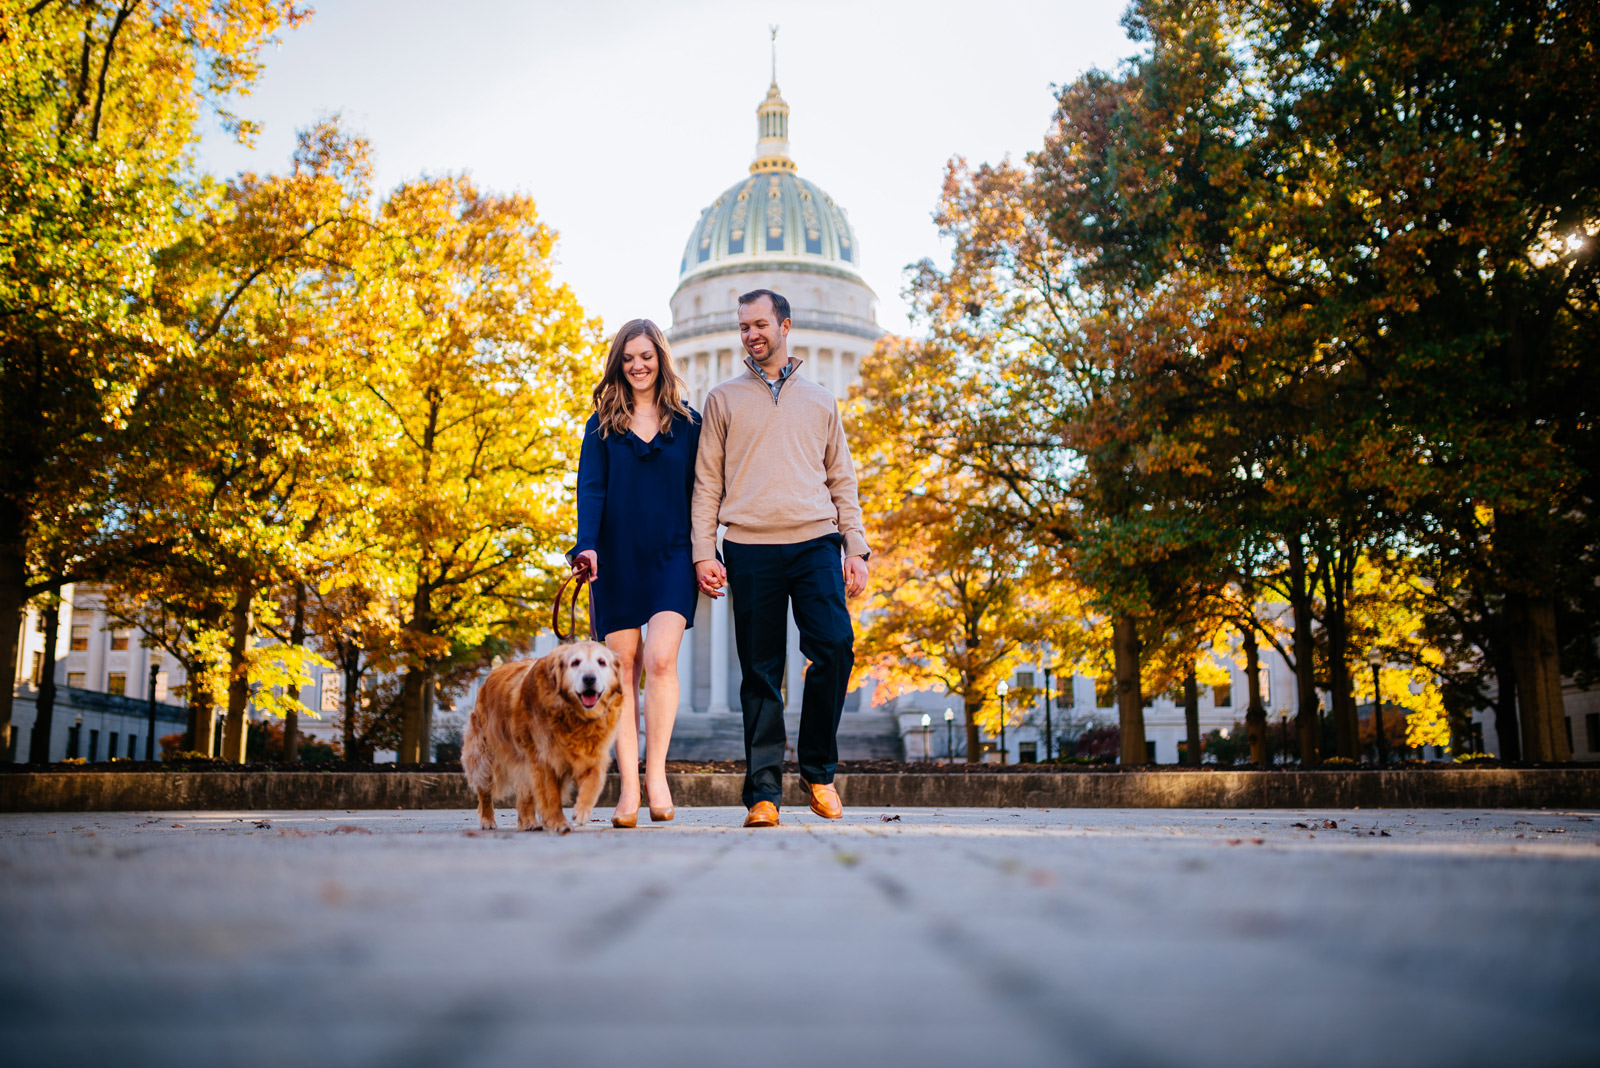 walking the dog fall charleston wv engagement photography